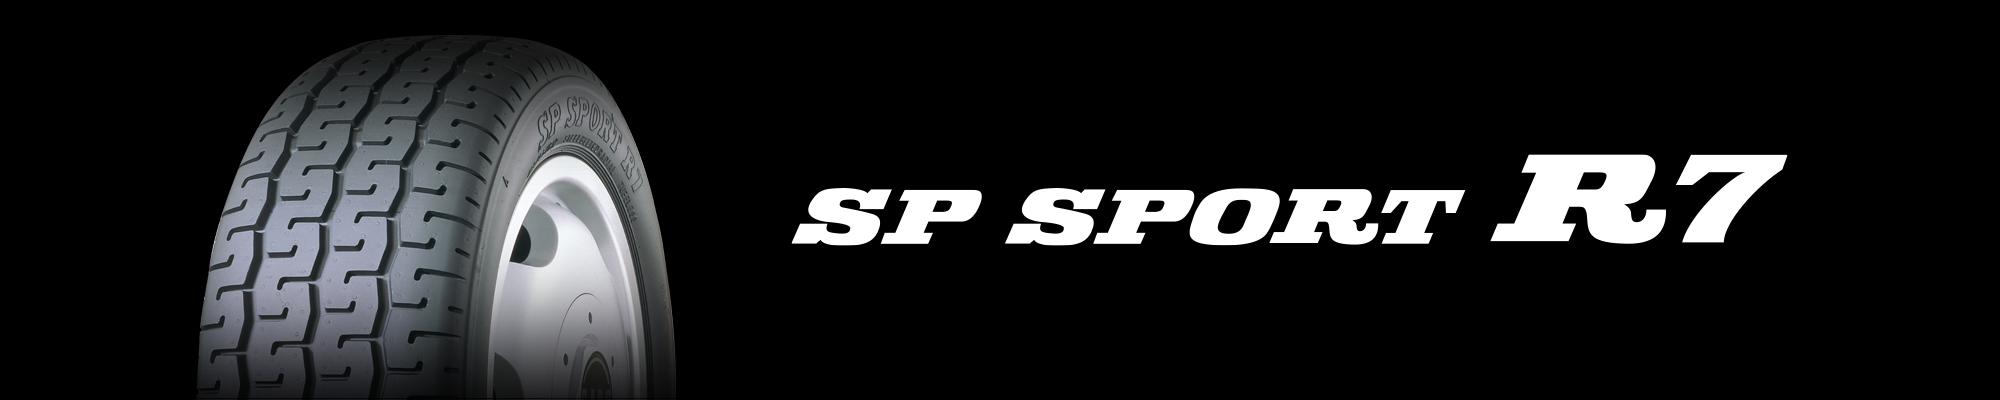 SP SPORT R7